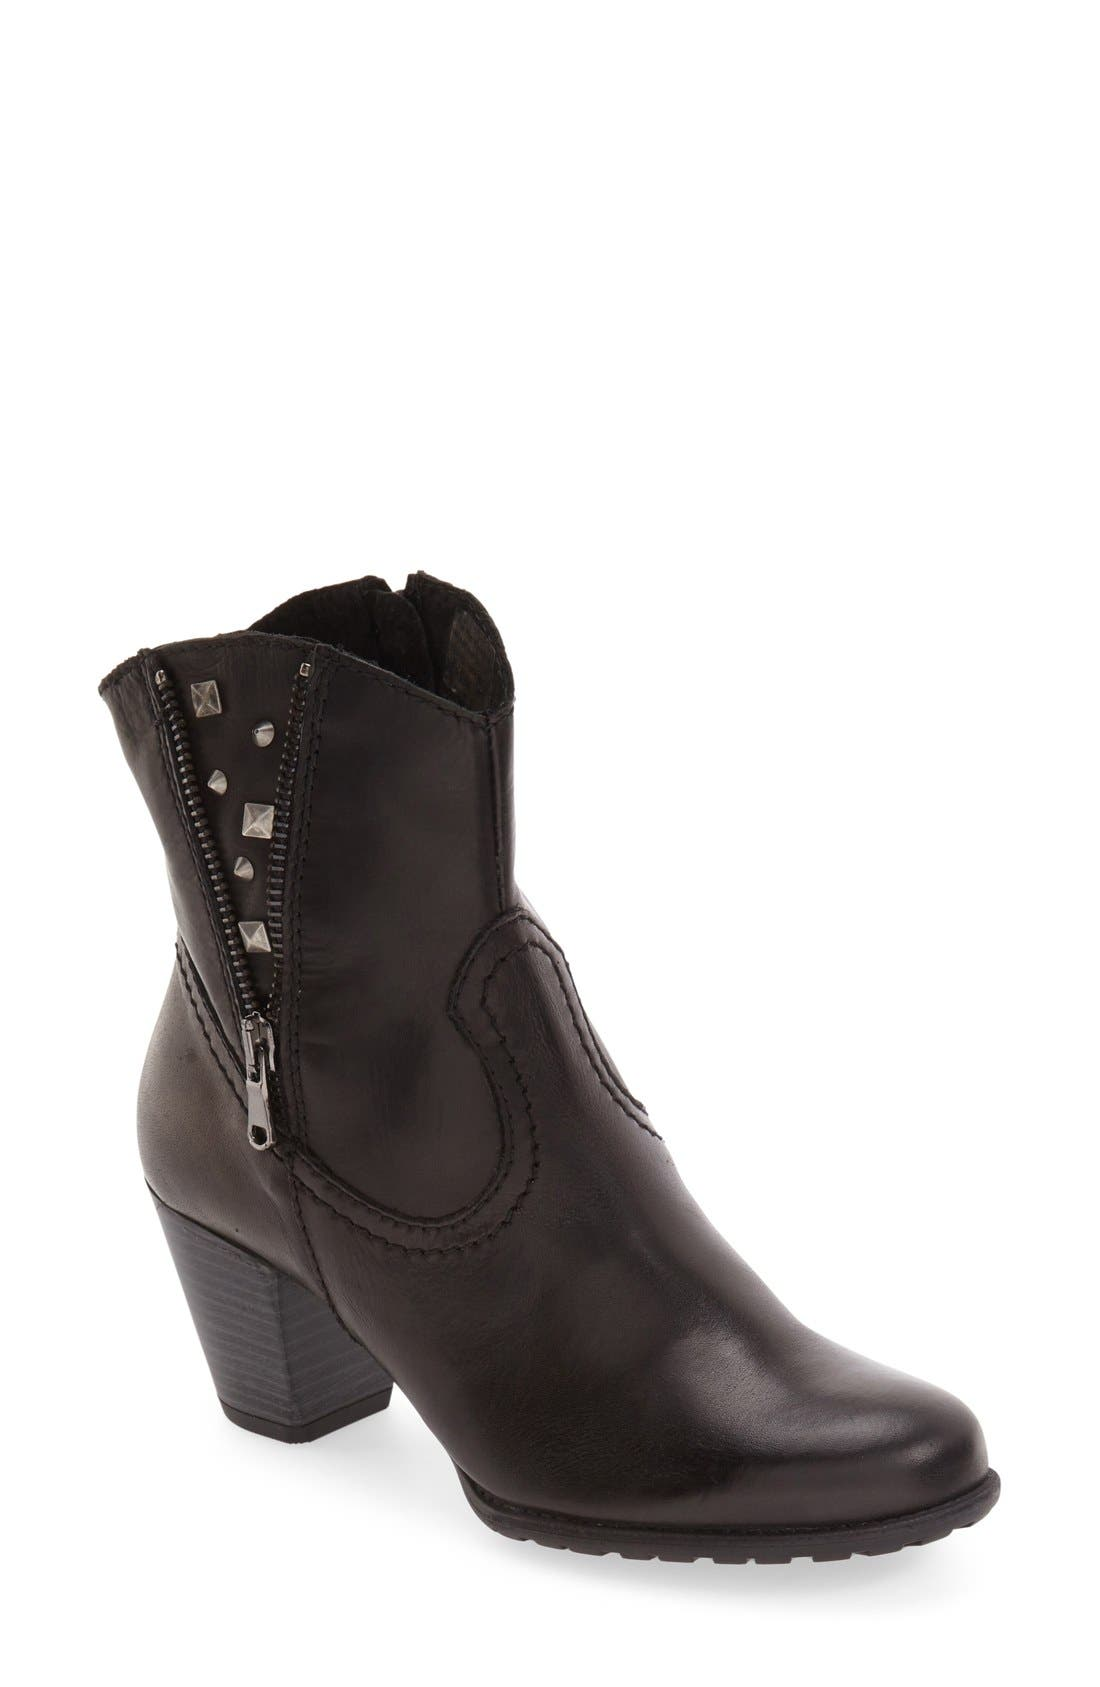 'Kiki' Studded Bootie,                         Main,                         color, Black Leather